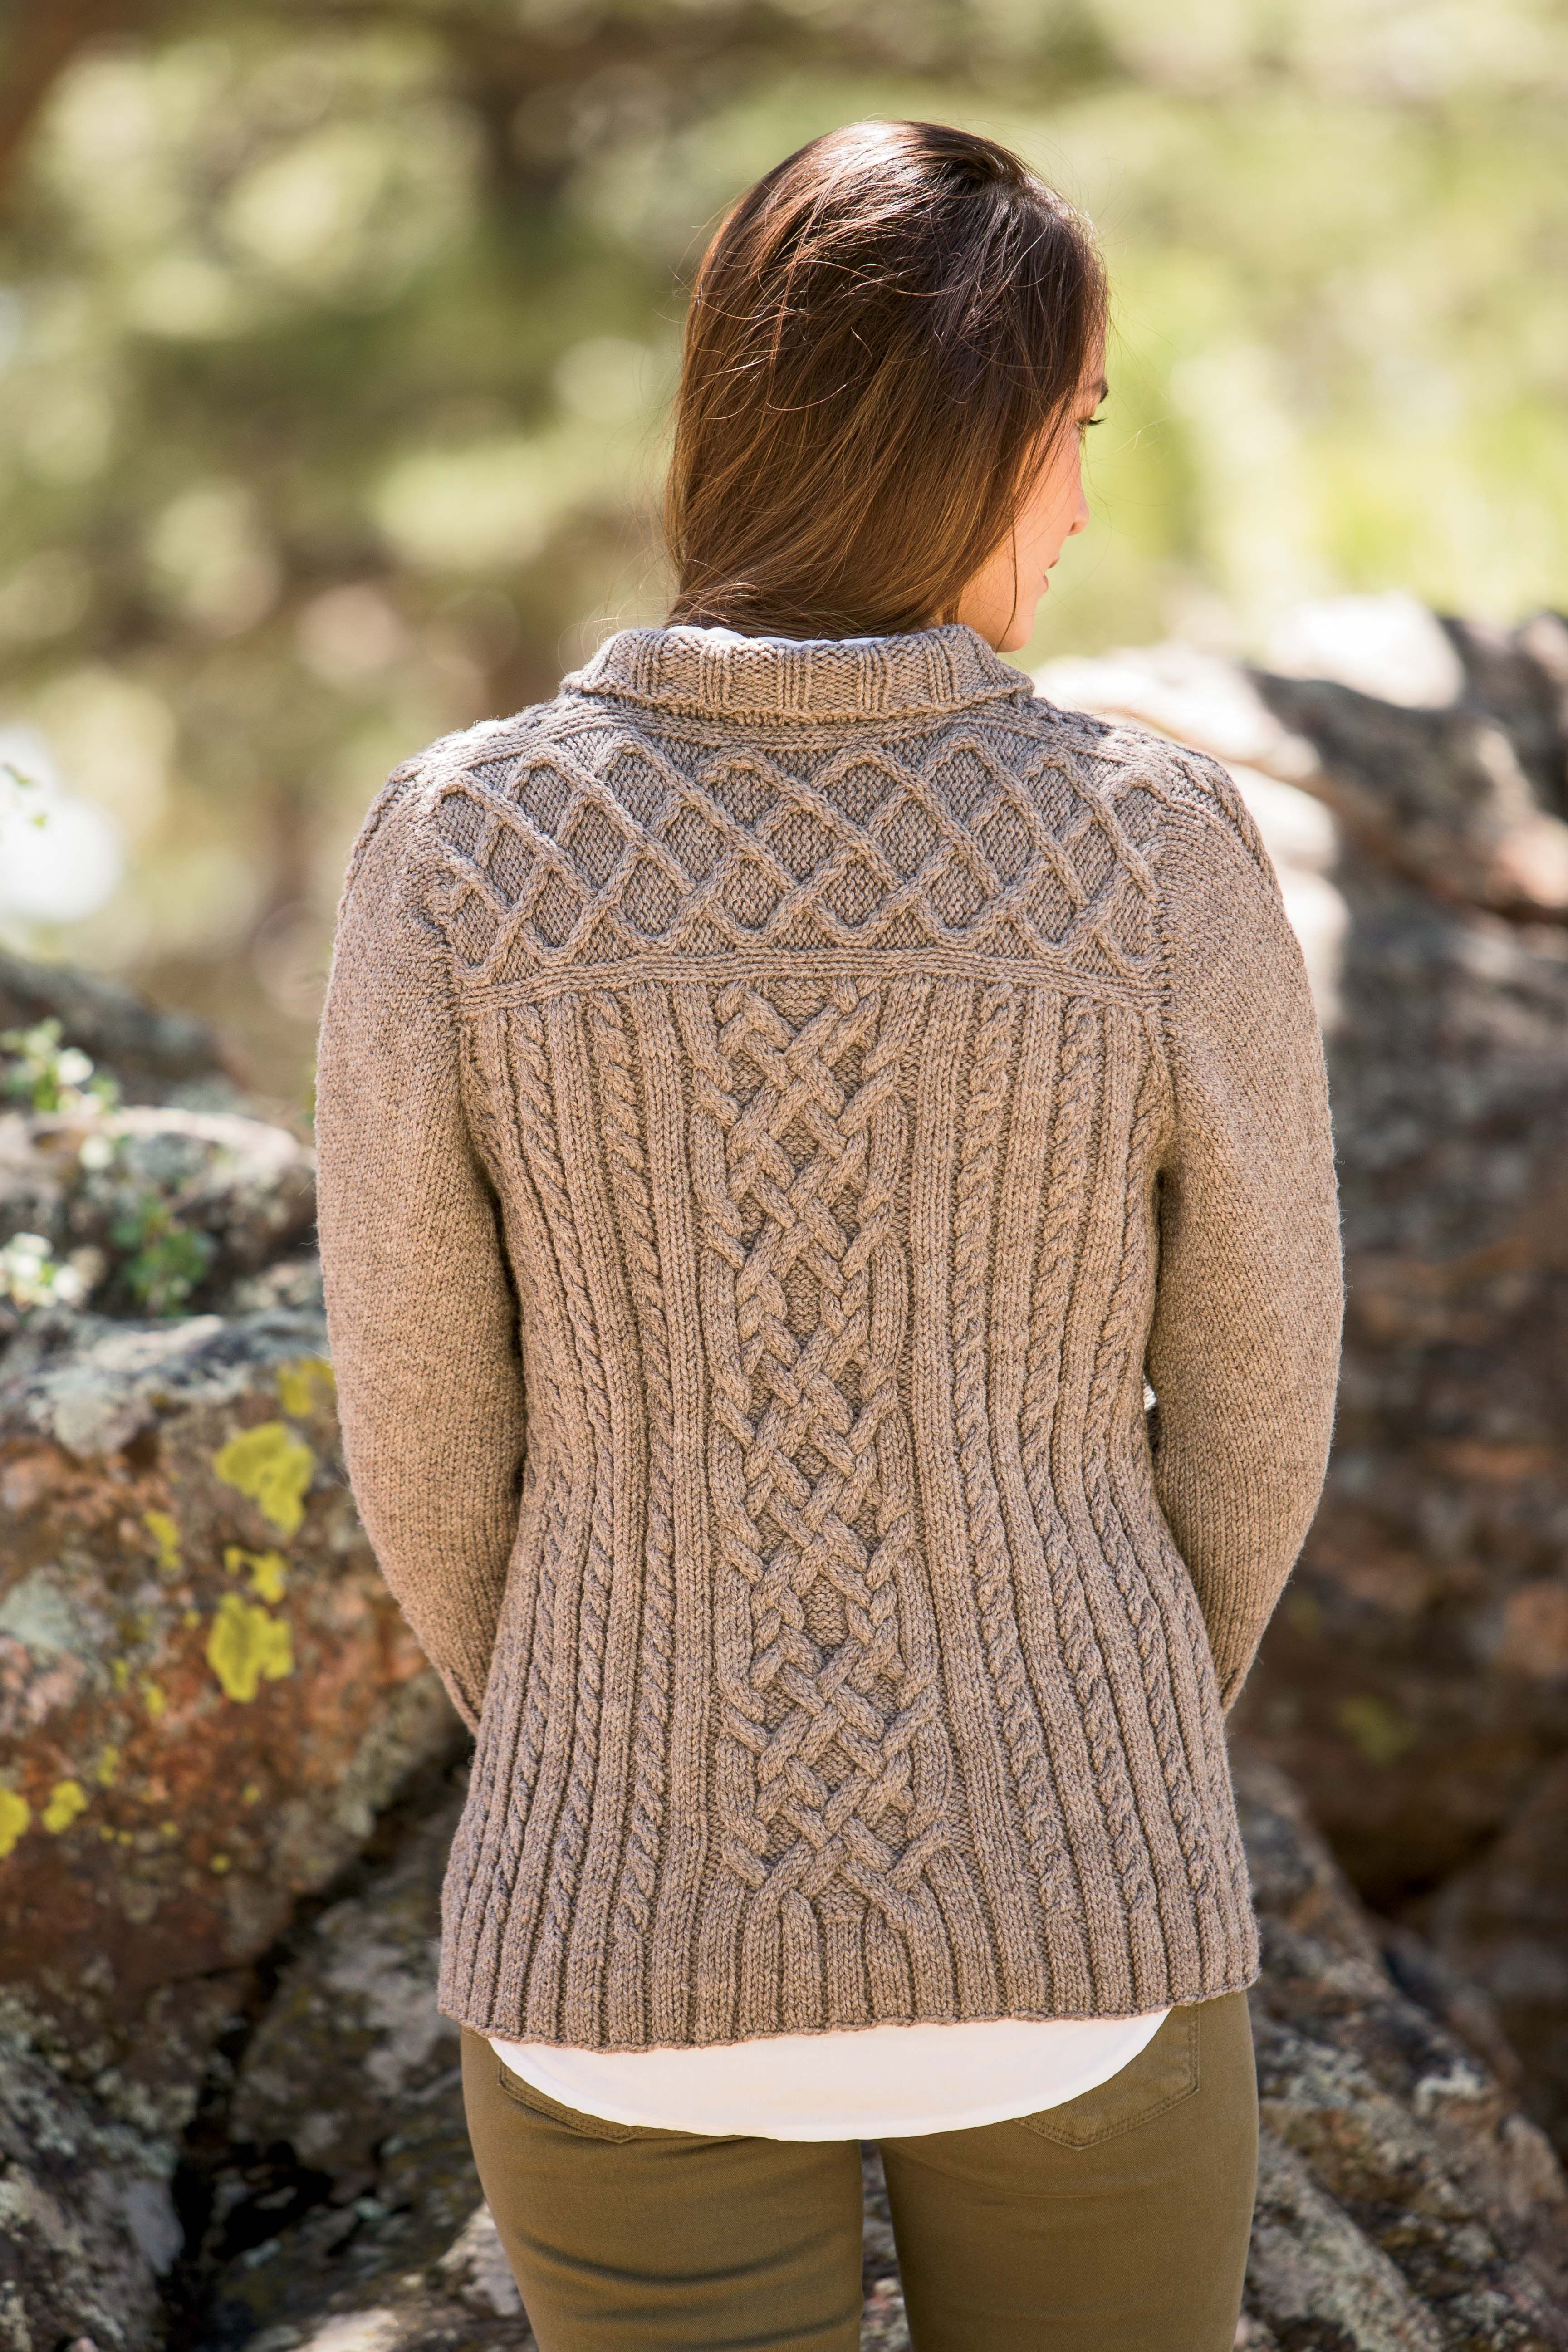 Knitted Yarn Patterns and Knitting Tutorials | Cardigan ...